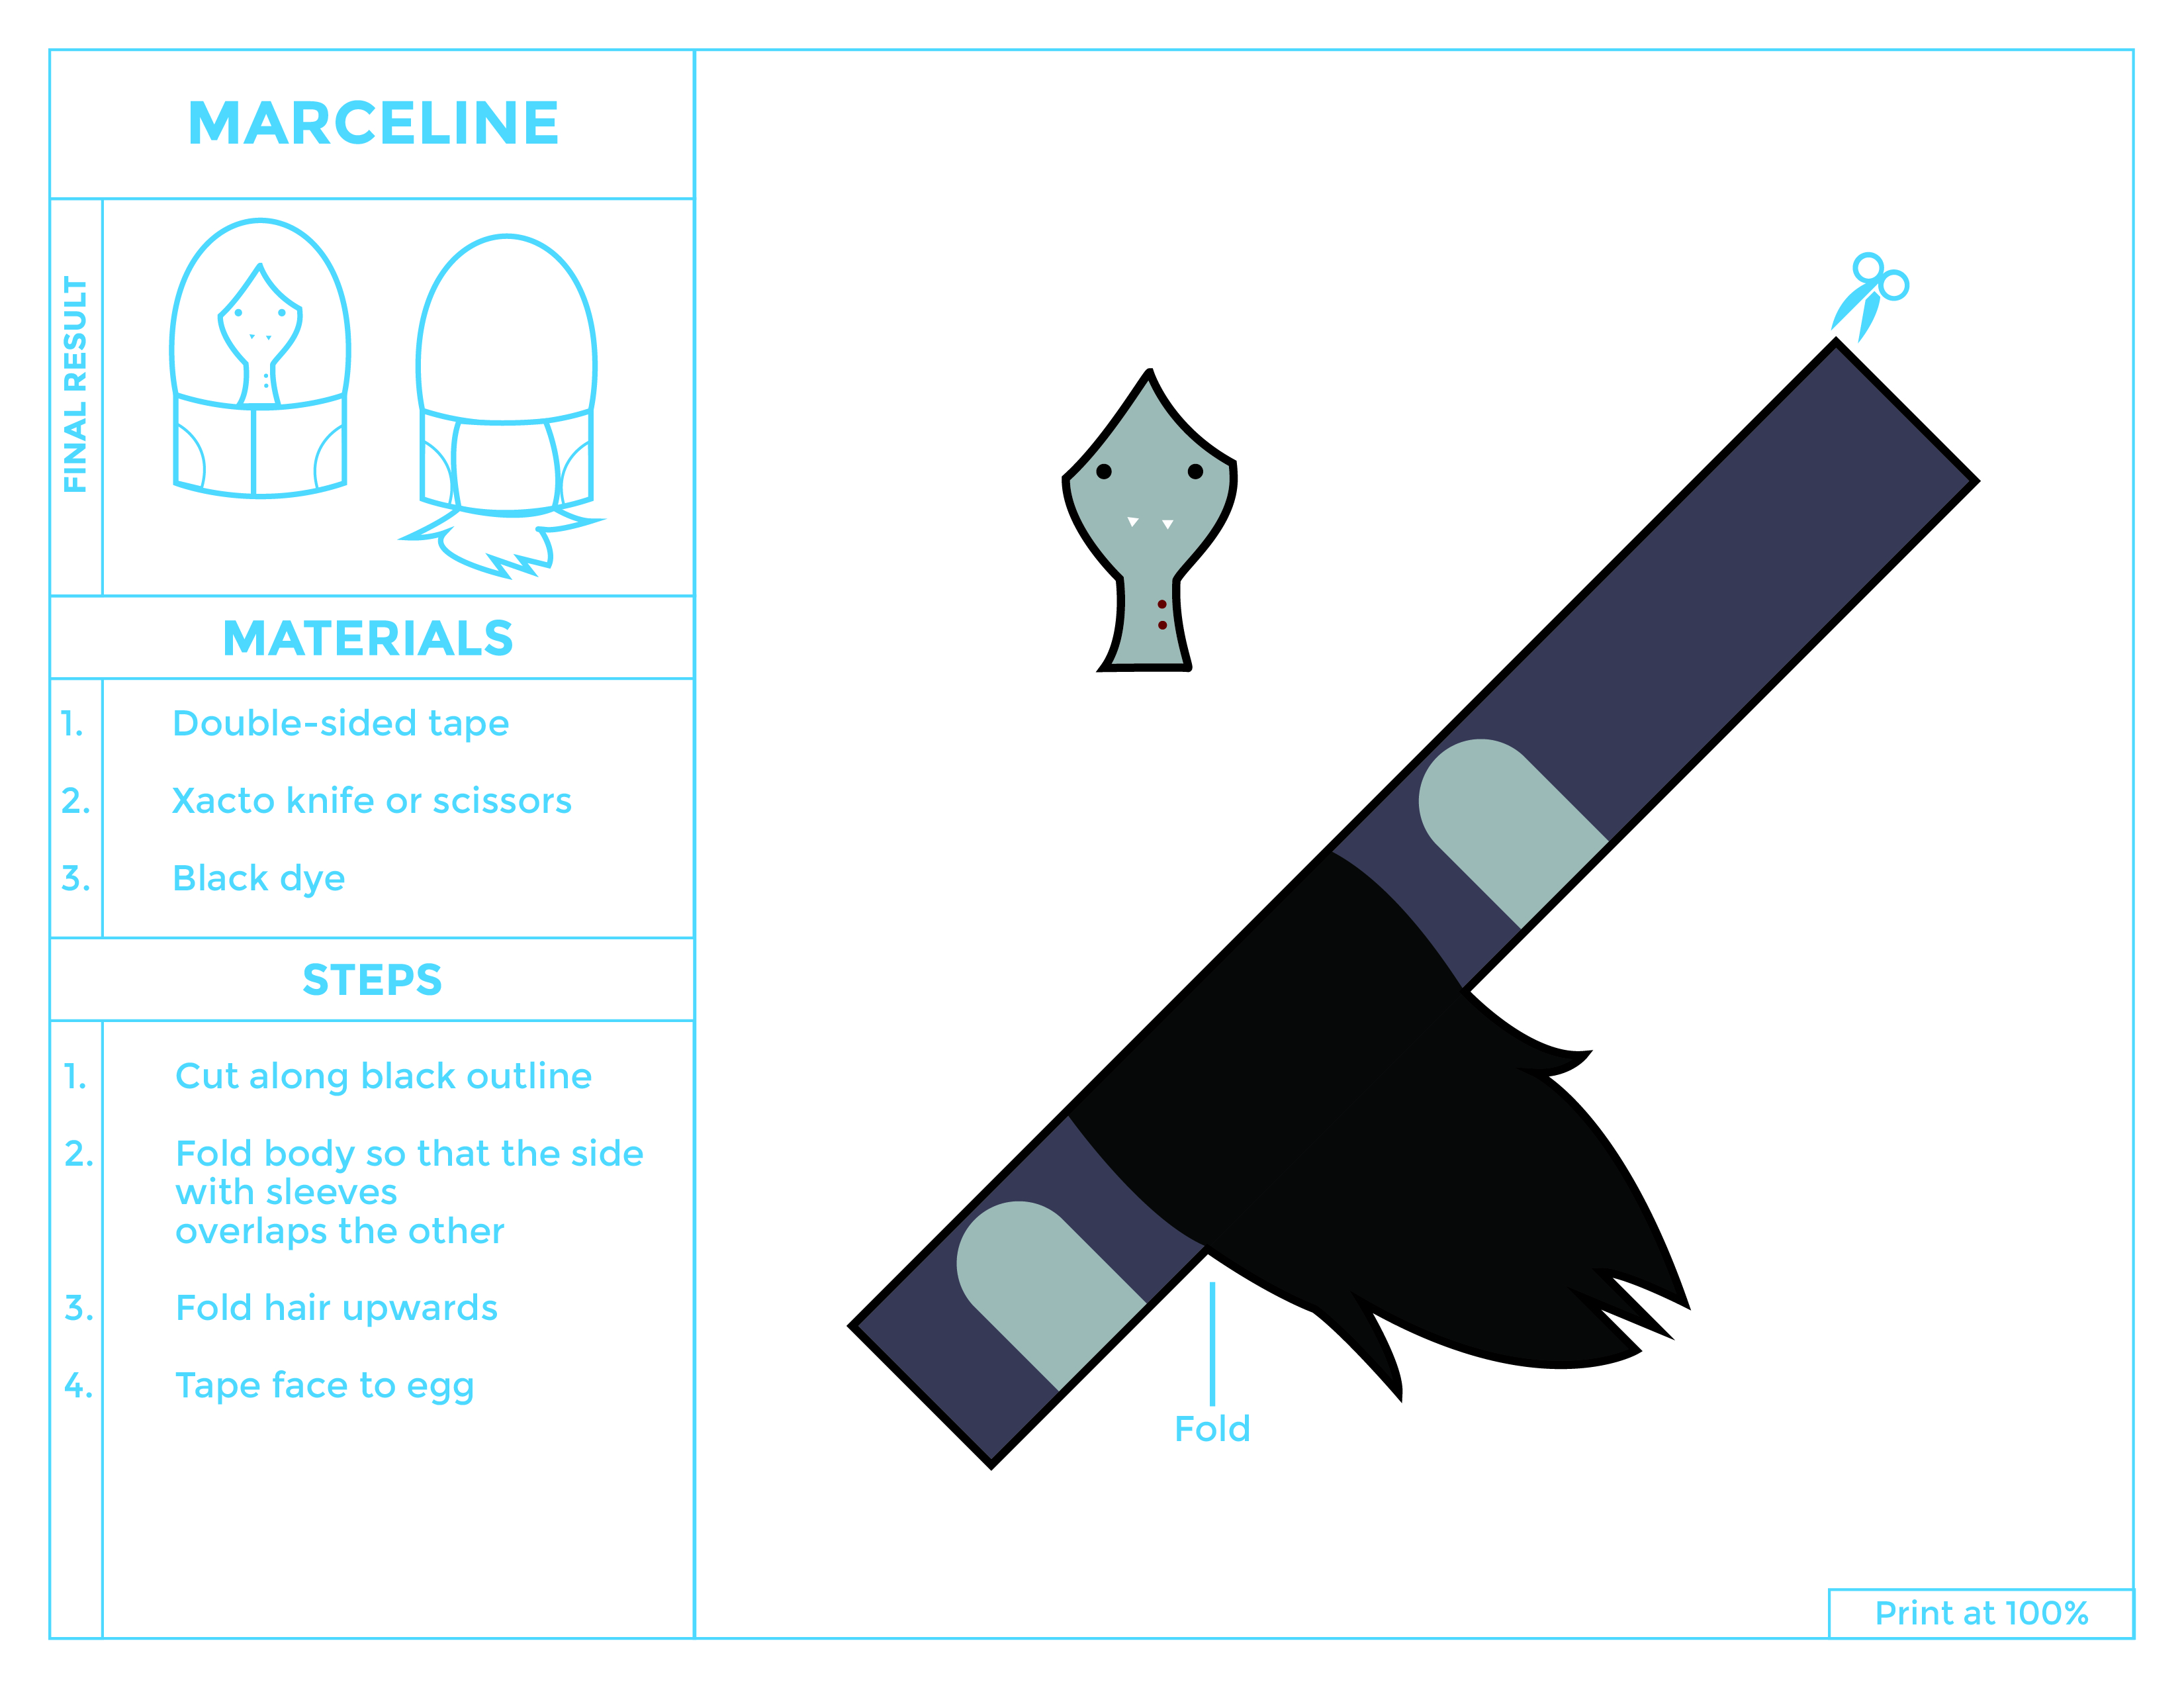 8 Marceline Adventure Time